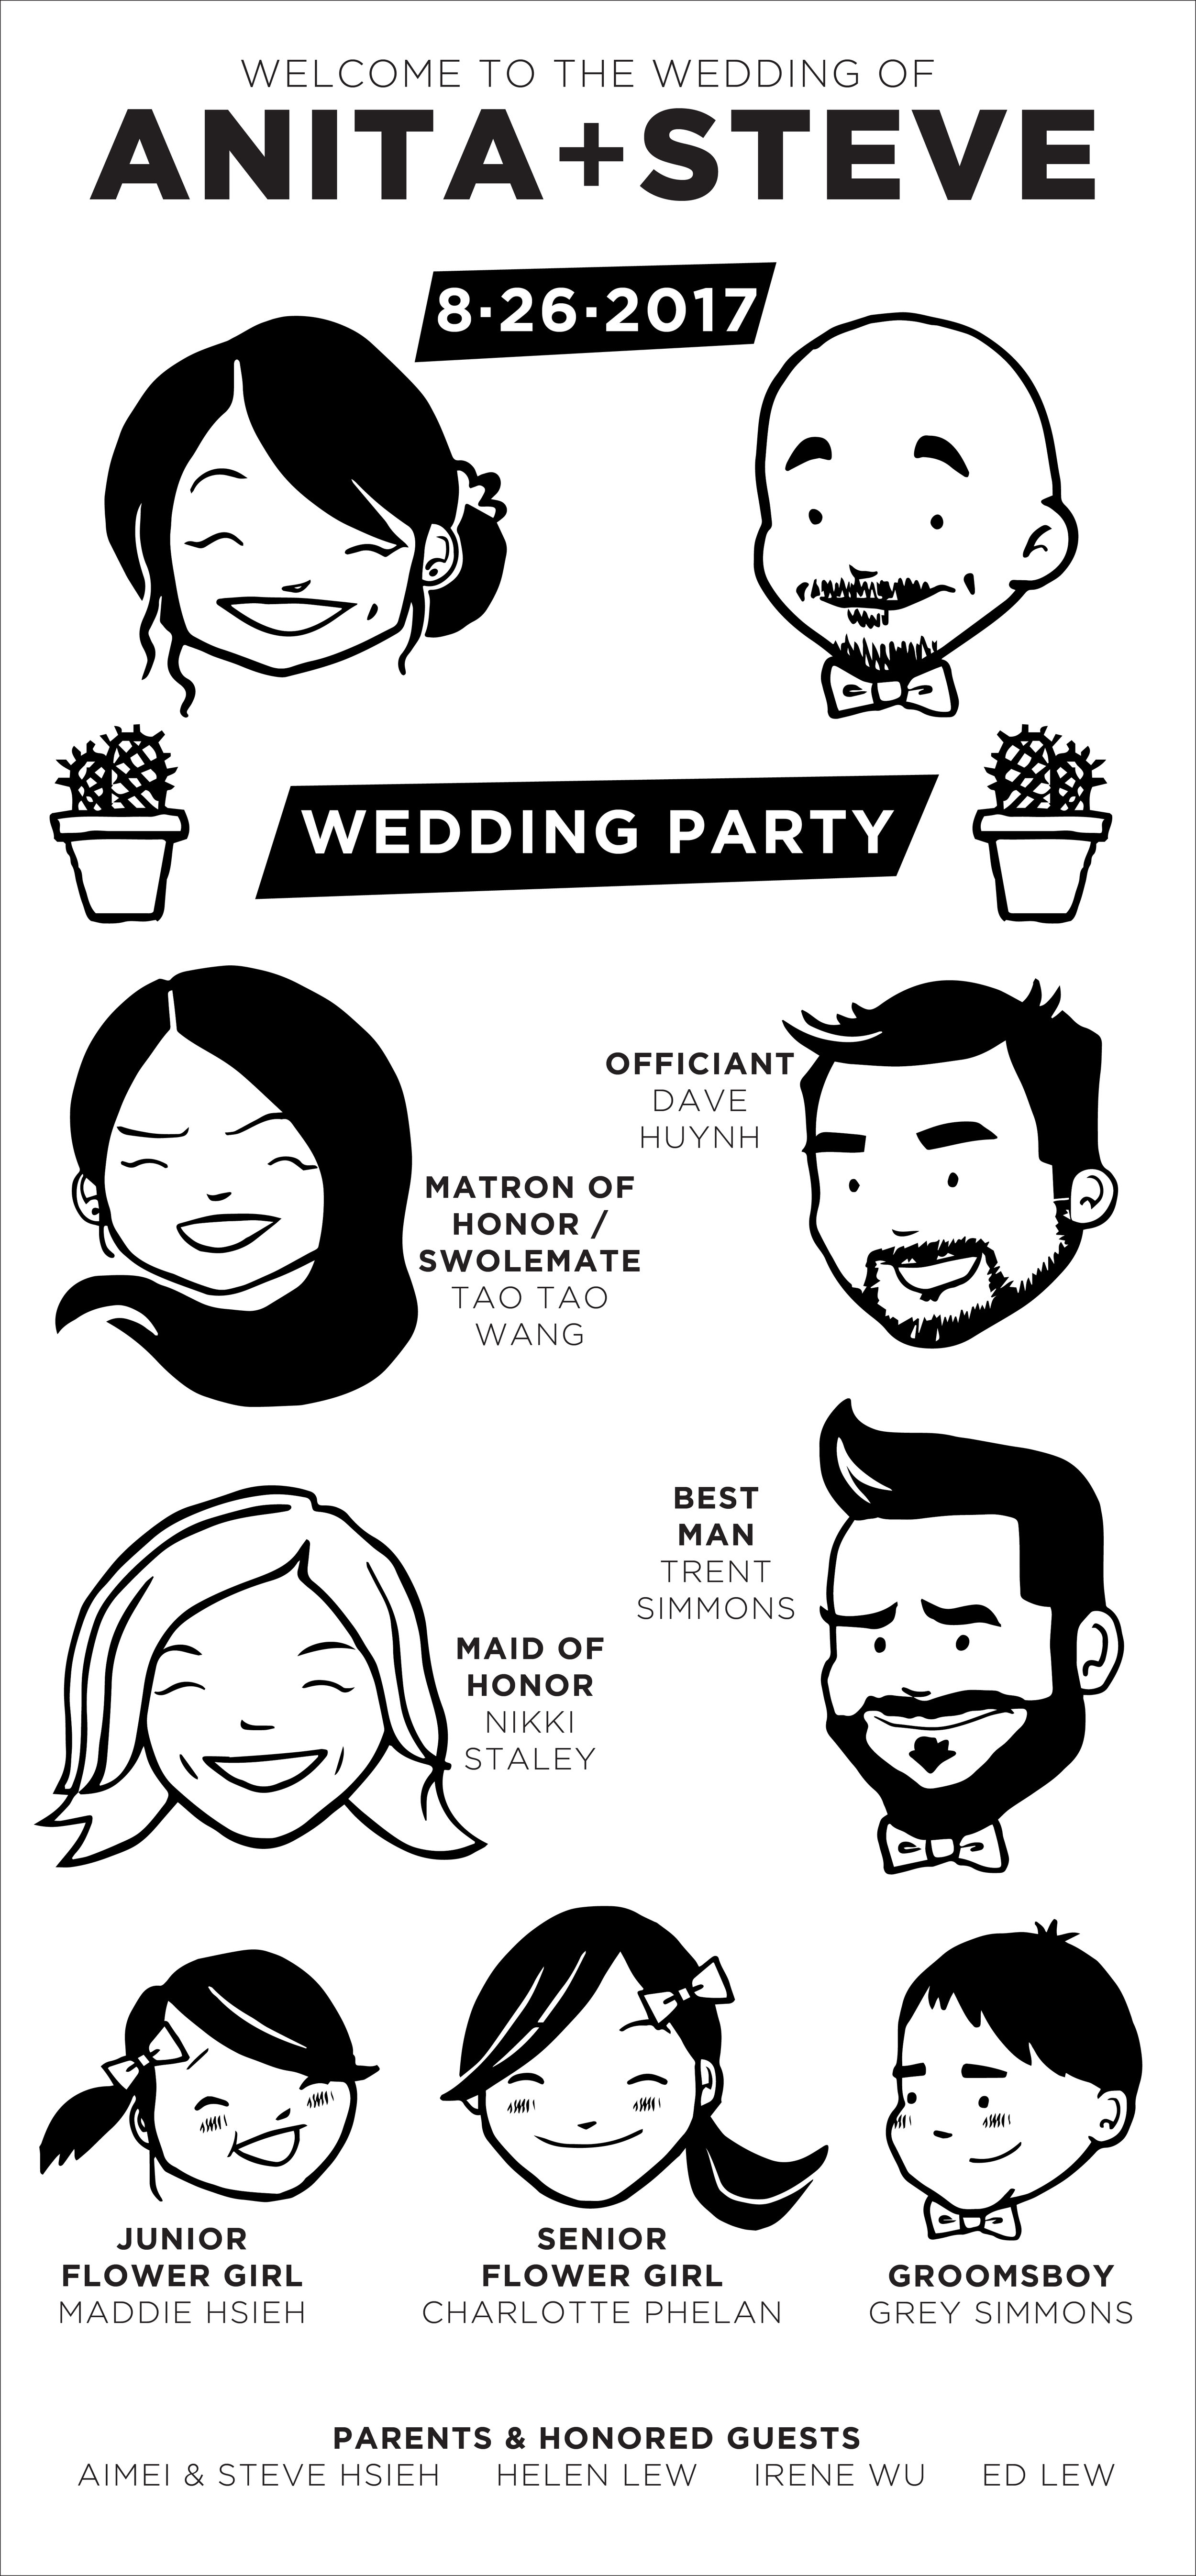 wedding party poster-01.jpg